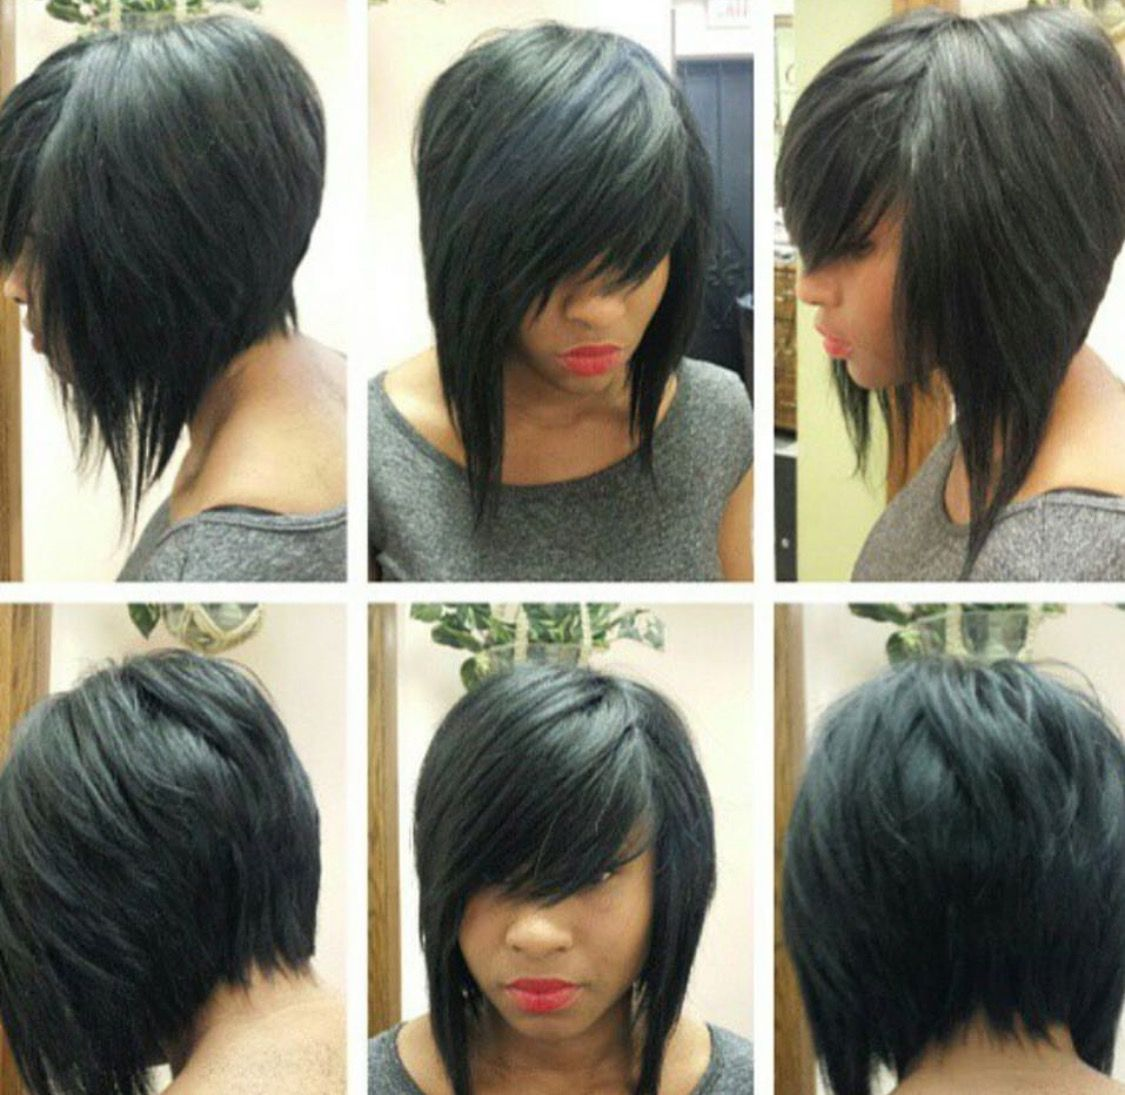 Cutechoppybob hairstyles pinterest bobs hair style and